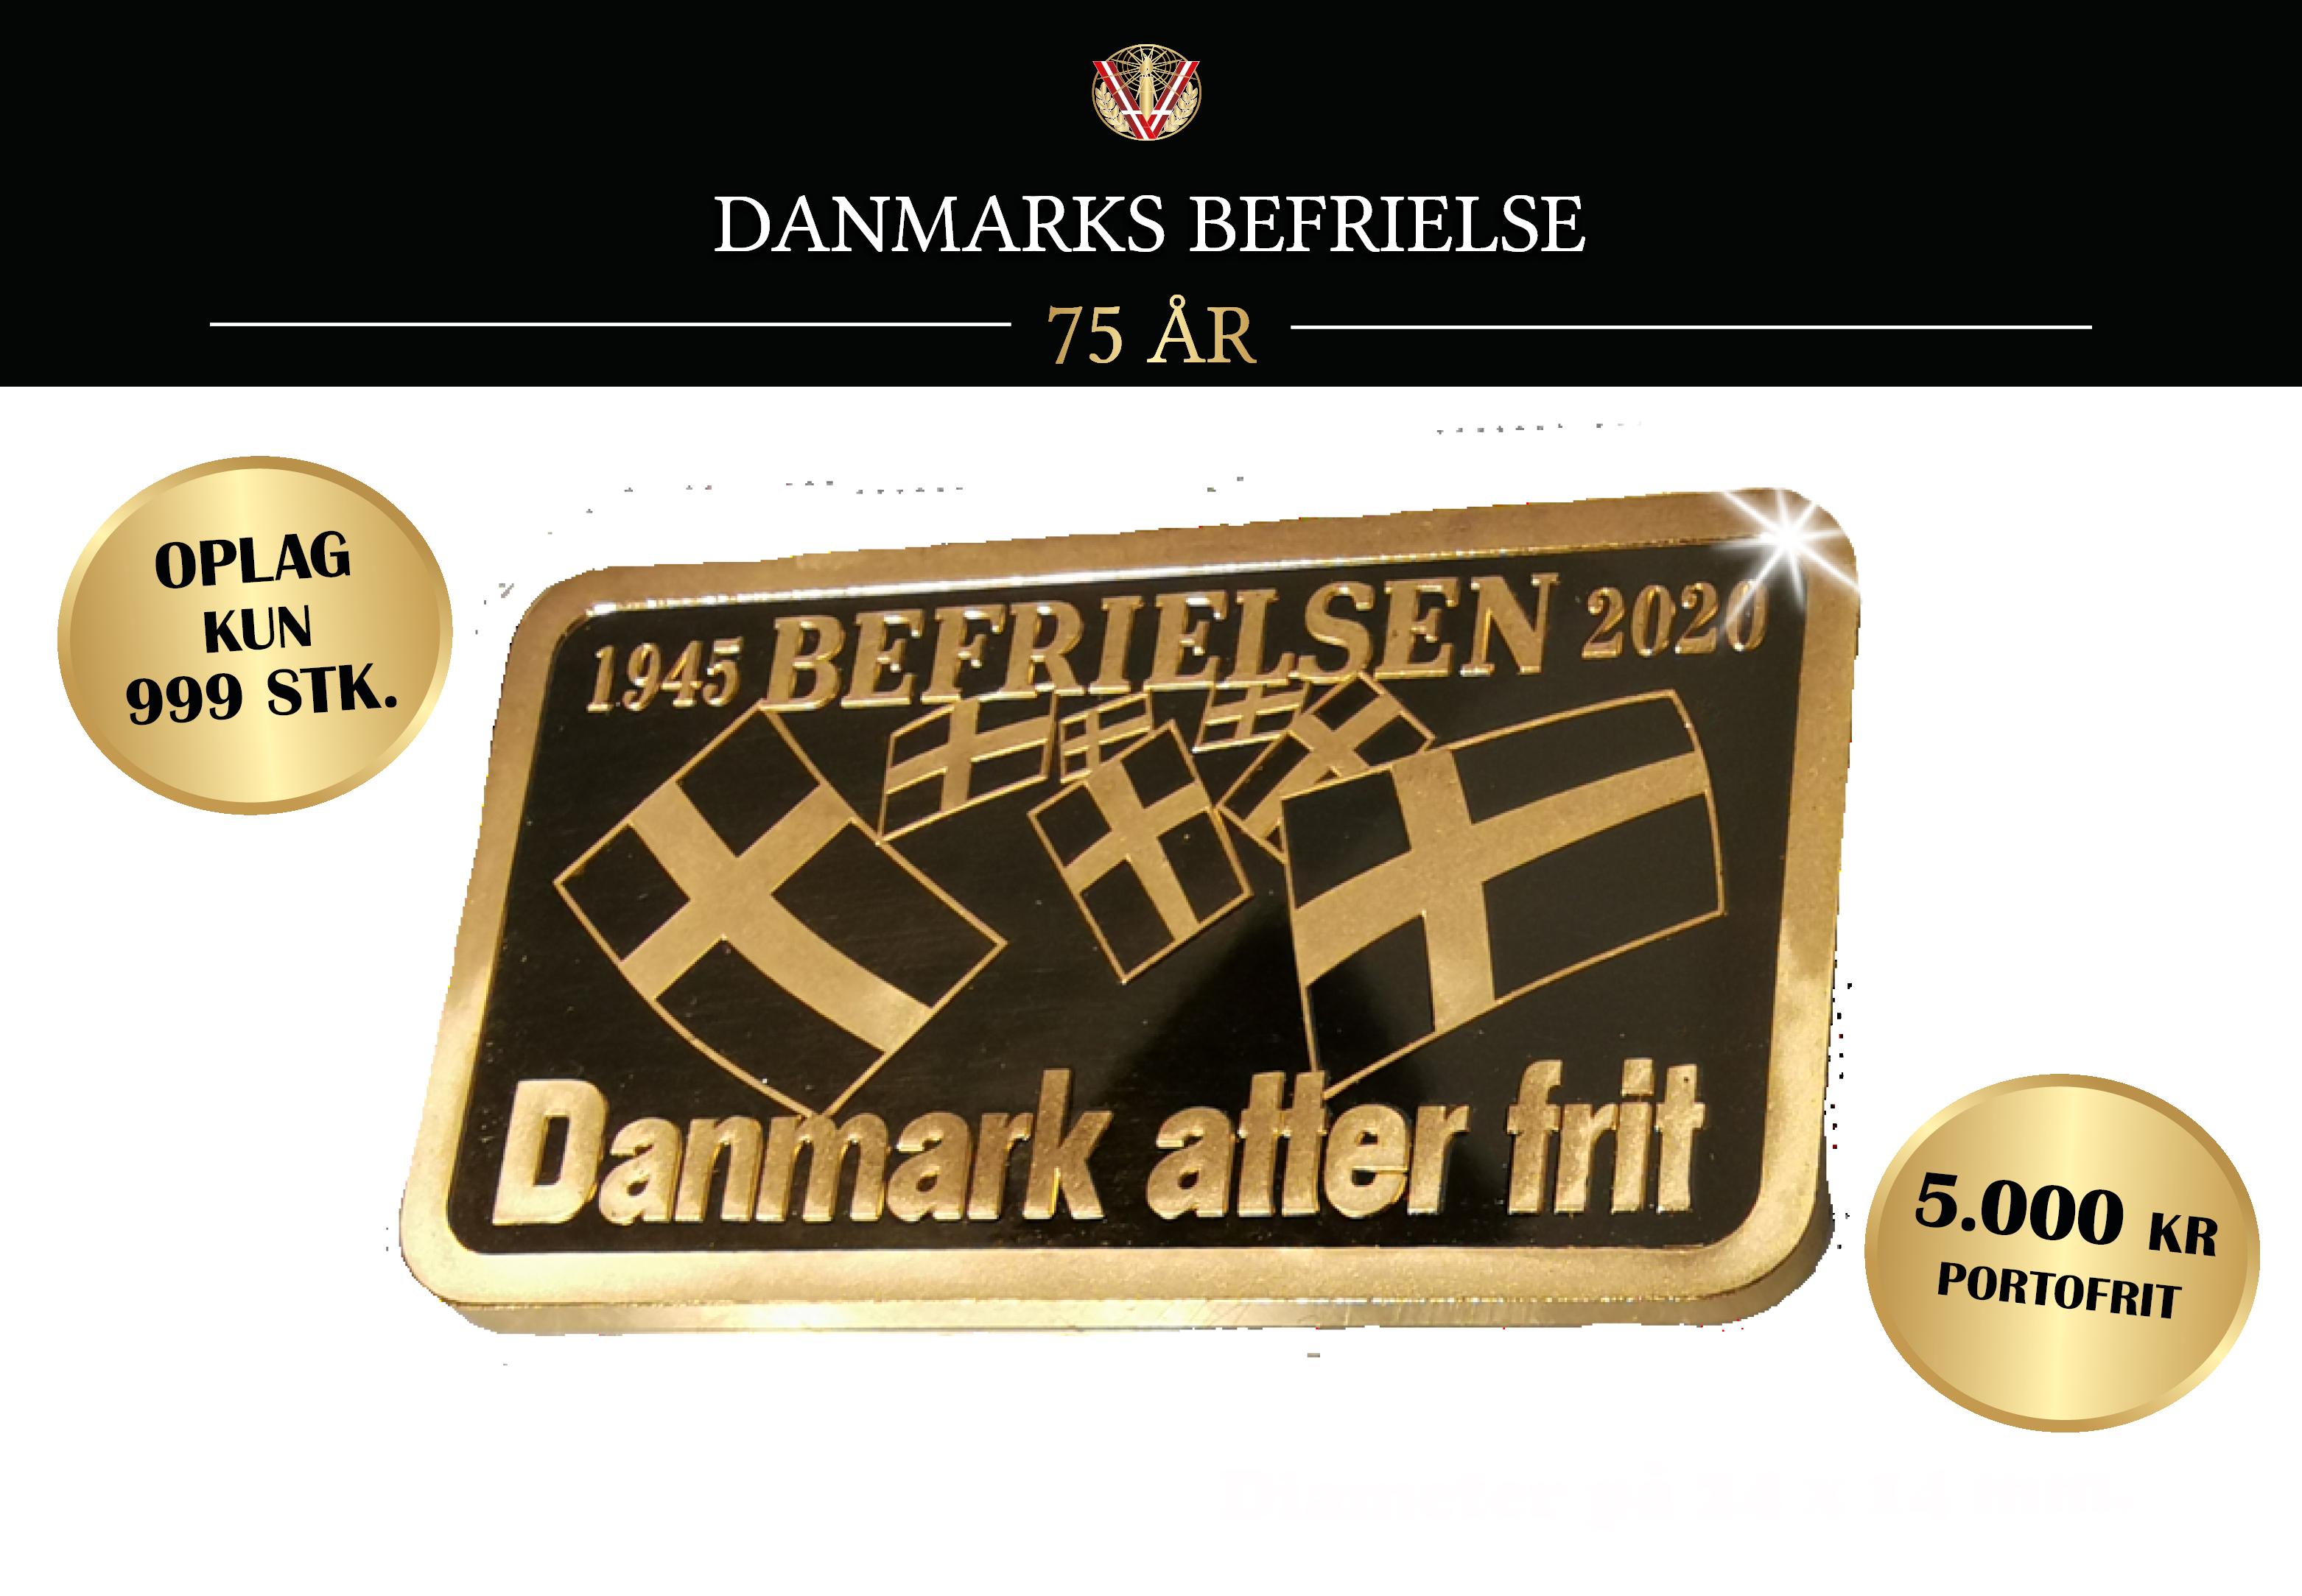 Danmarks befrielse 75 år - 5 gram guldbarre i hele 24 karat guld!